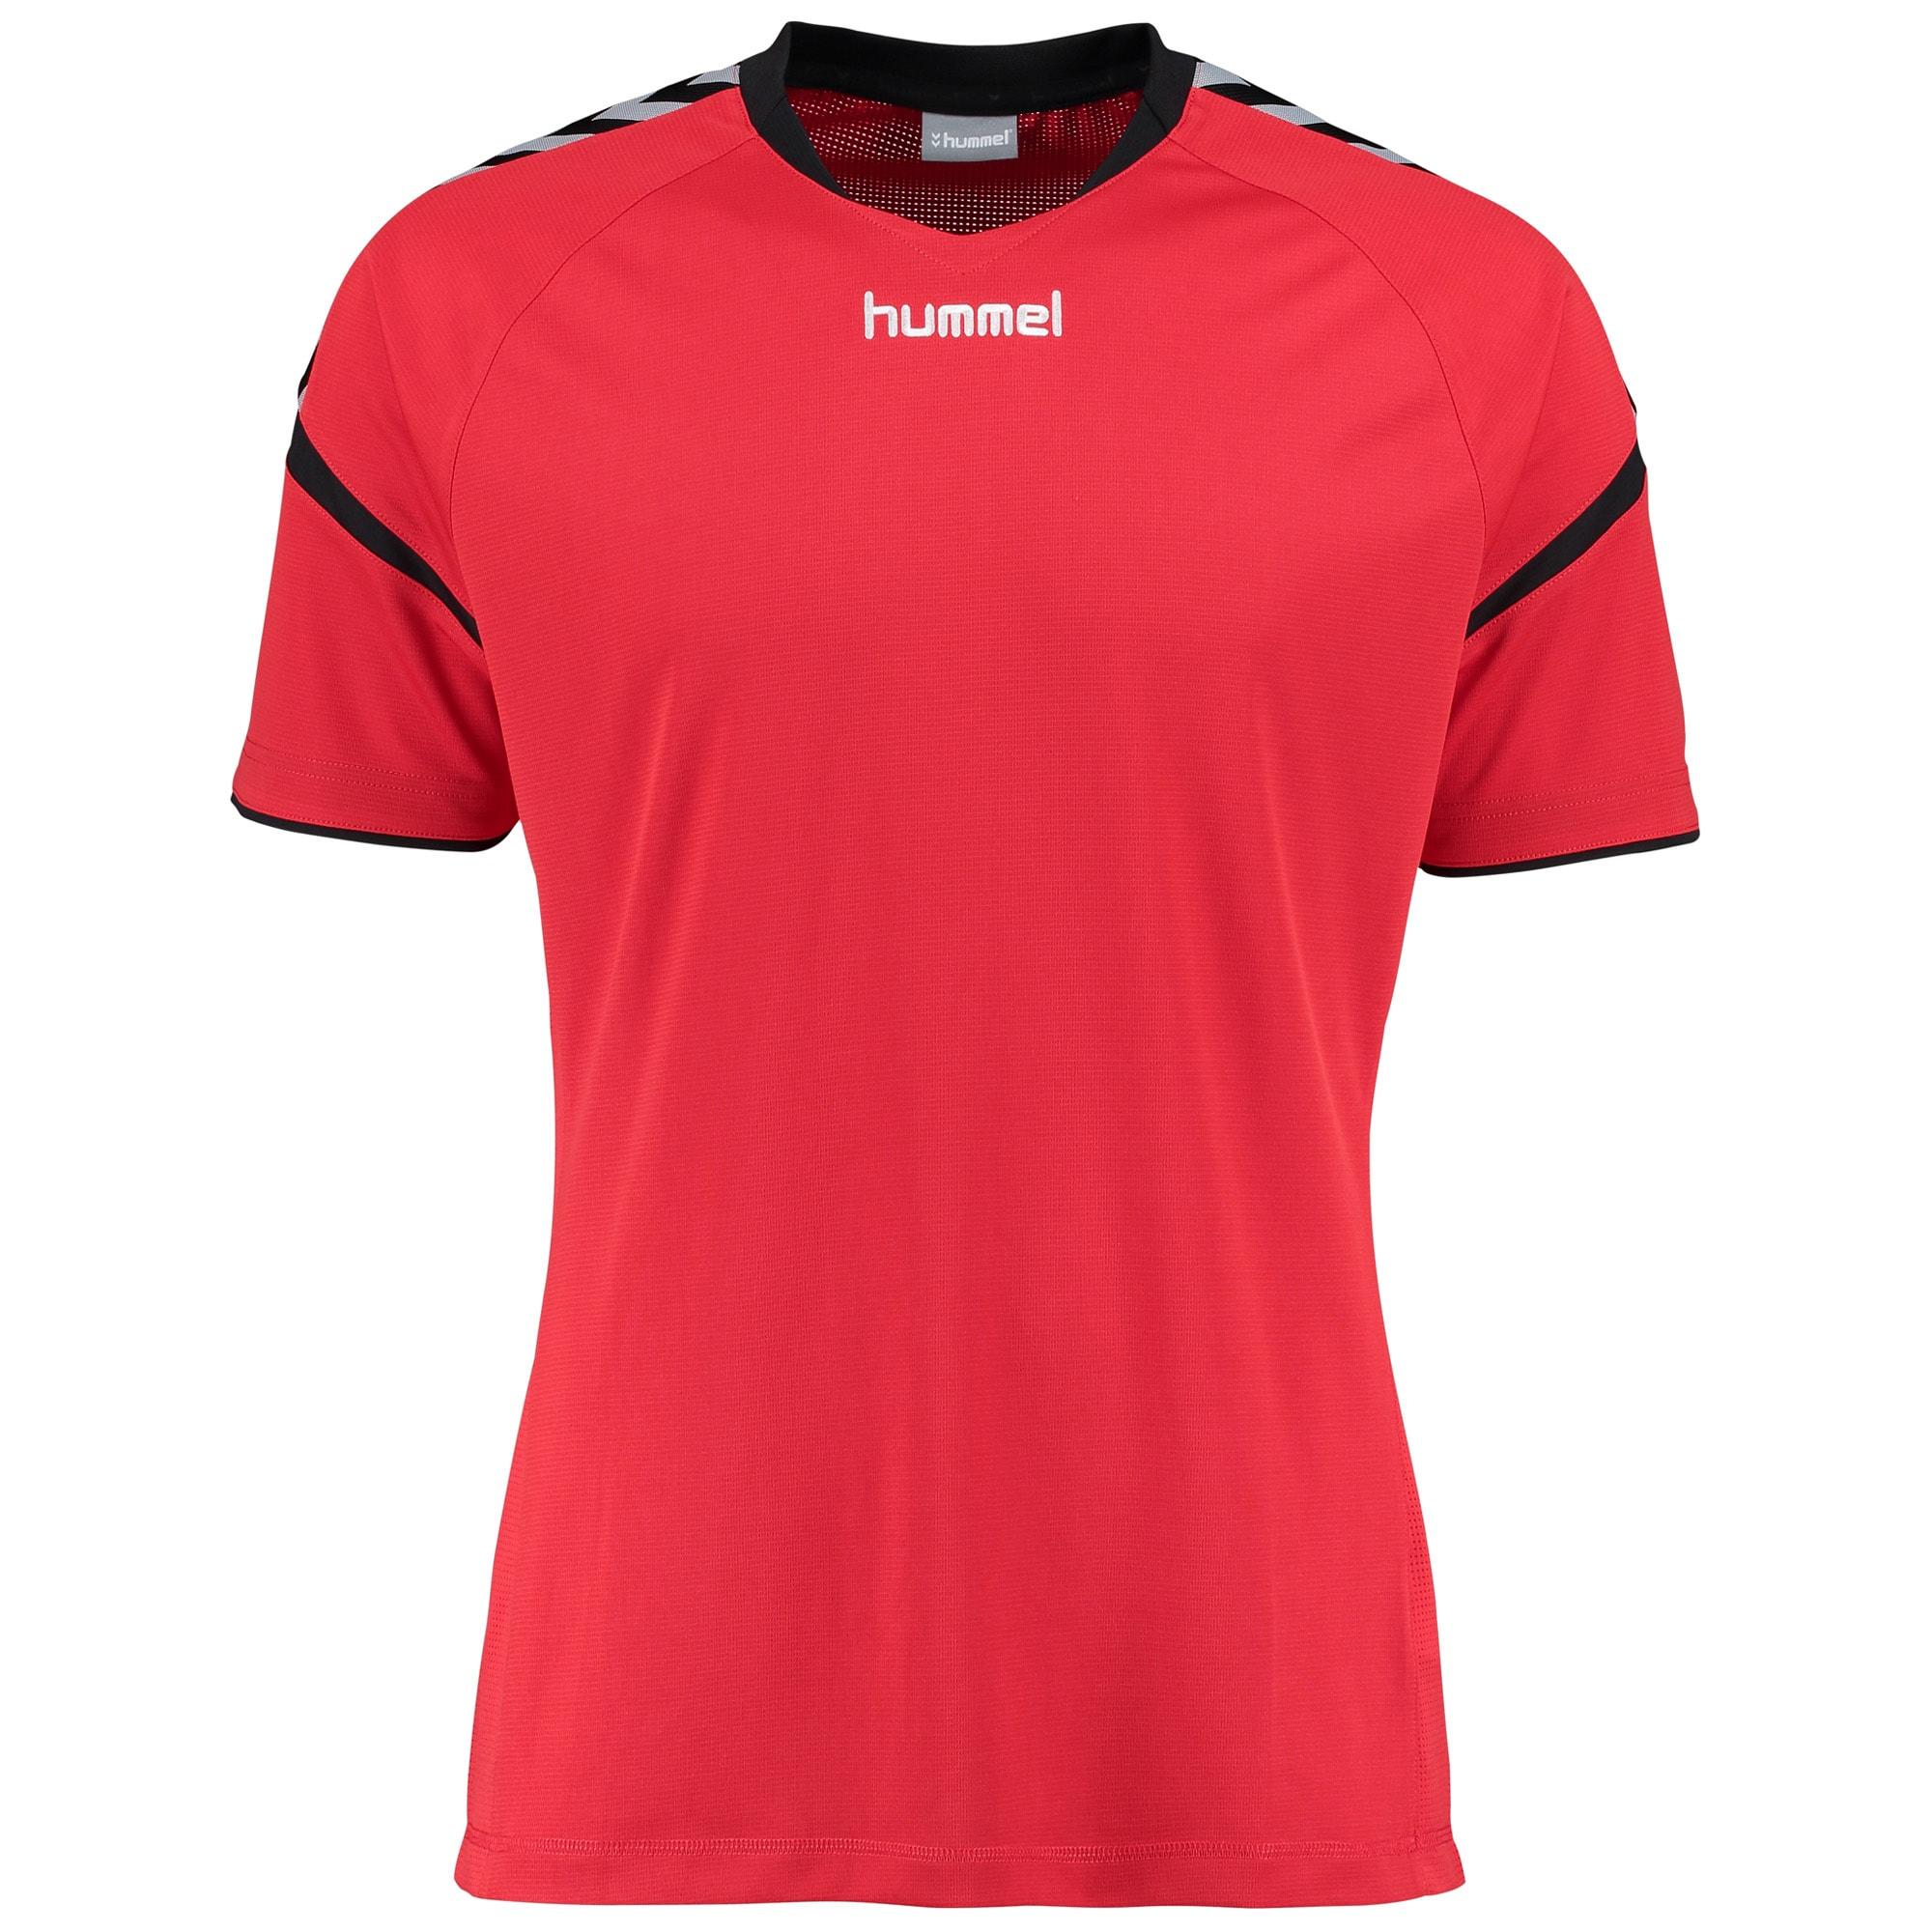 Authentic Charge Handballtrikot | Sportbekleidung > Trikots > Handballtrikots | Hummel